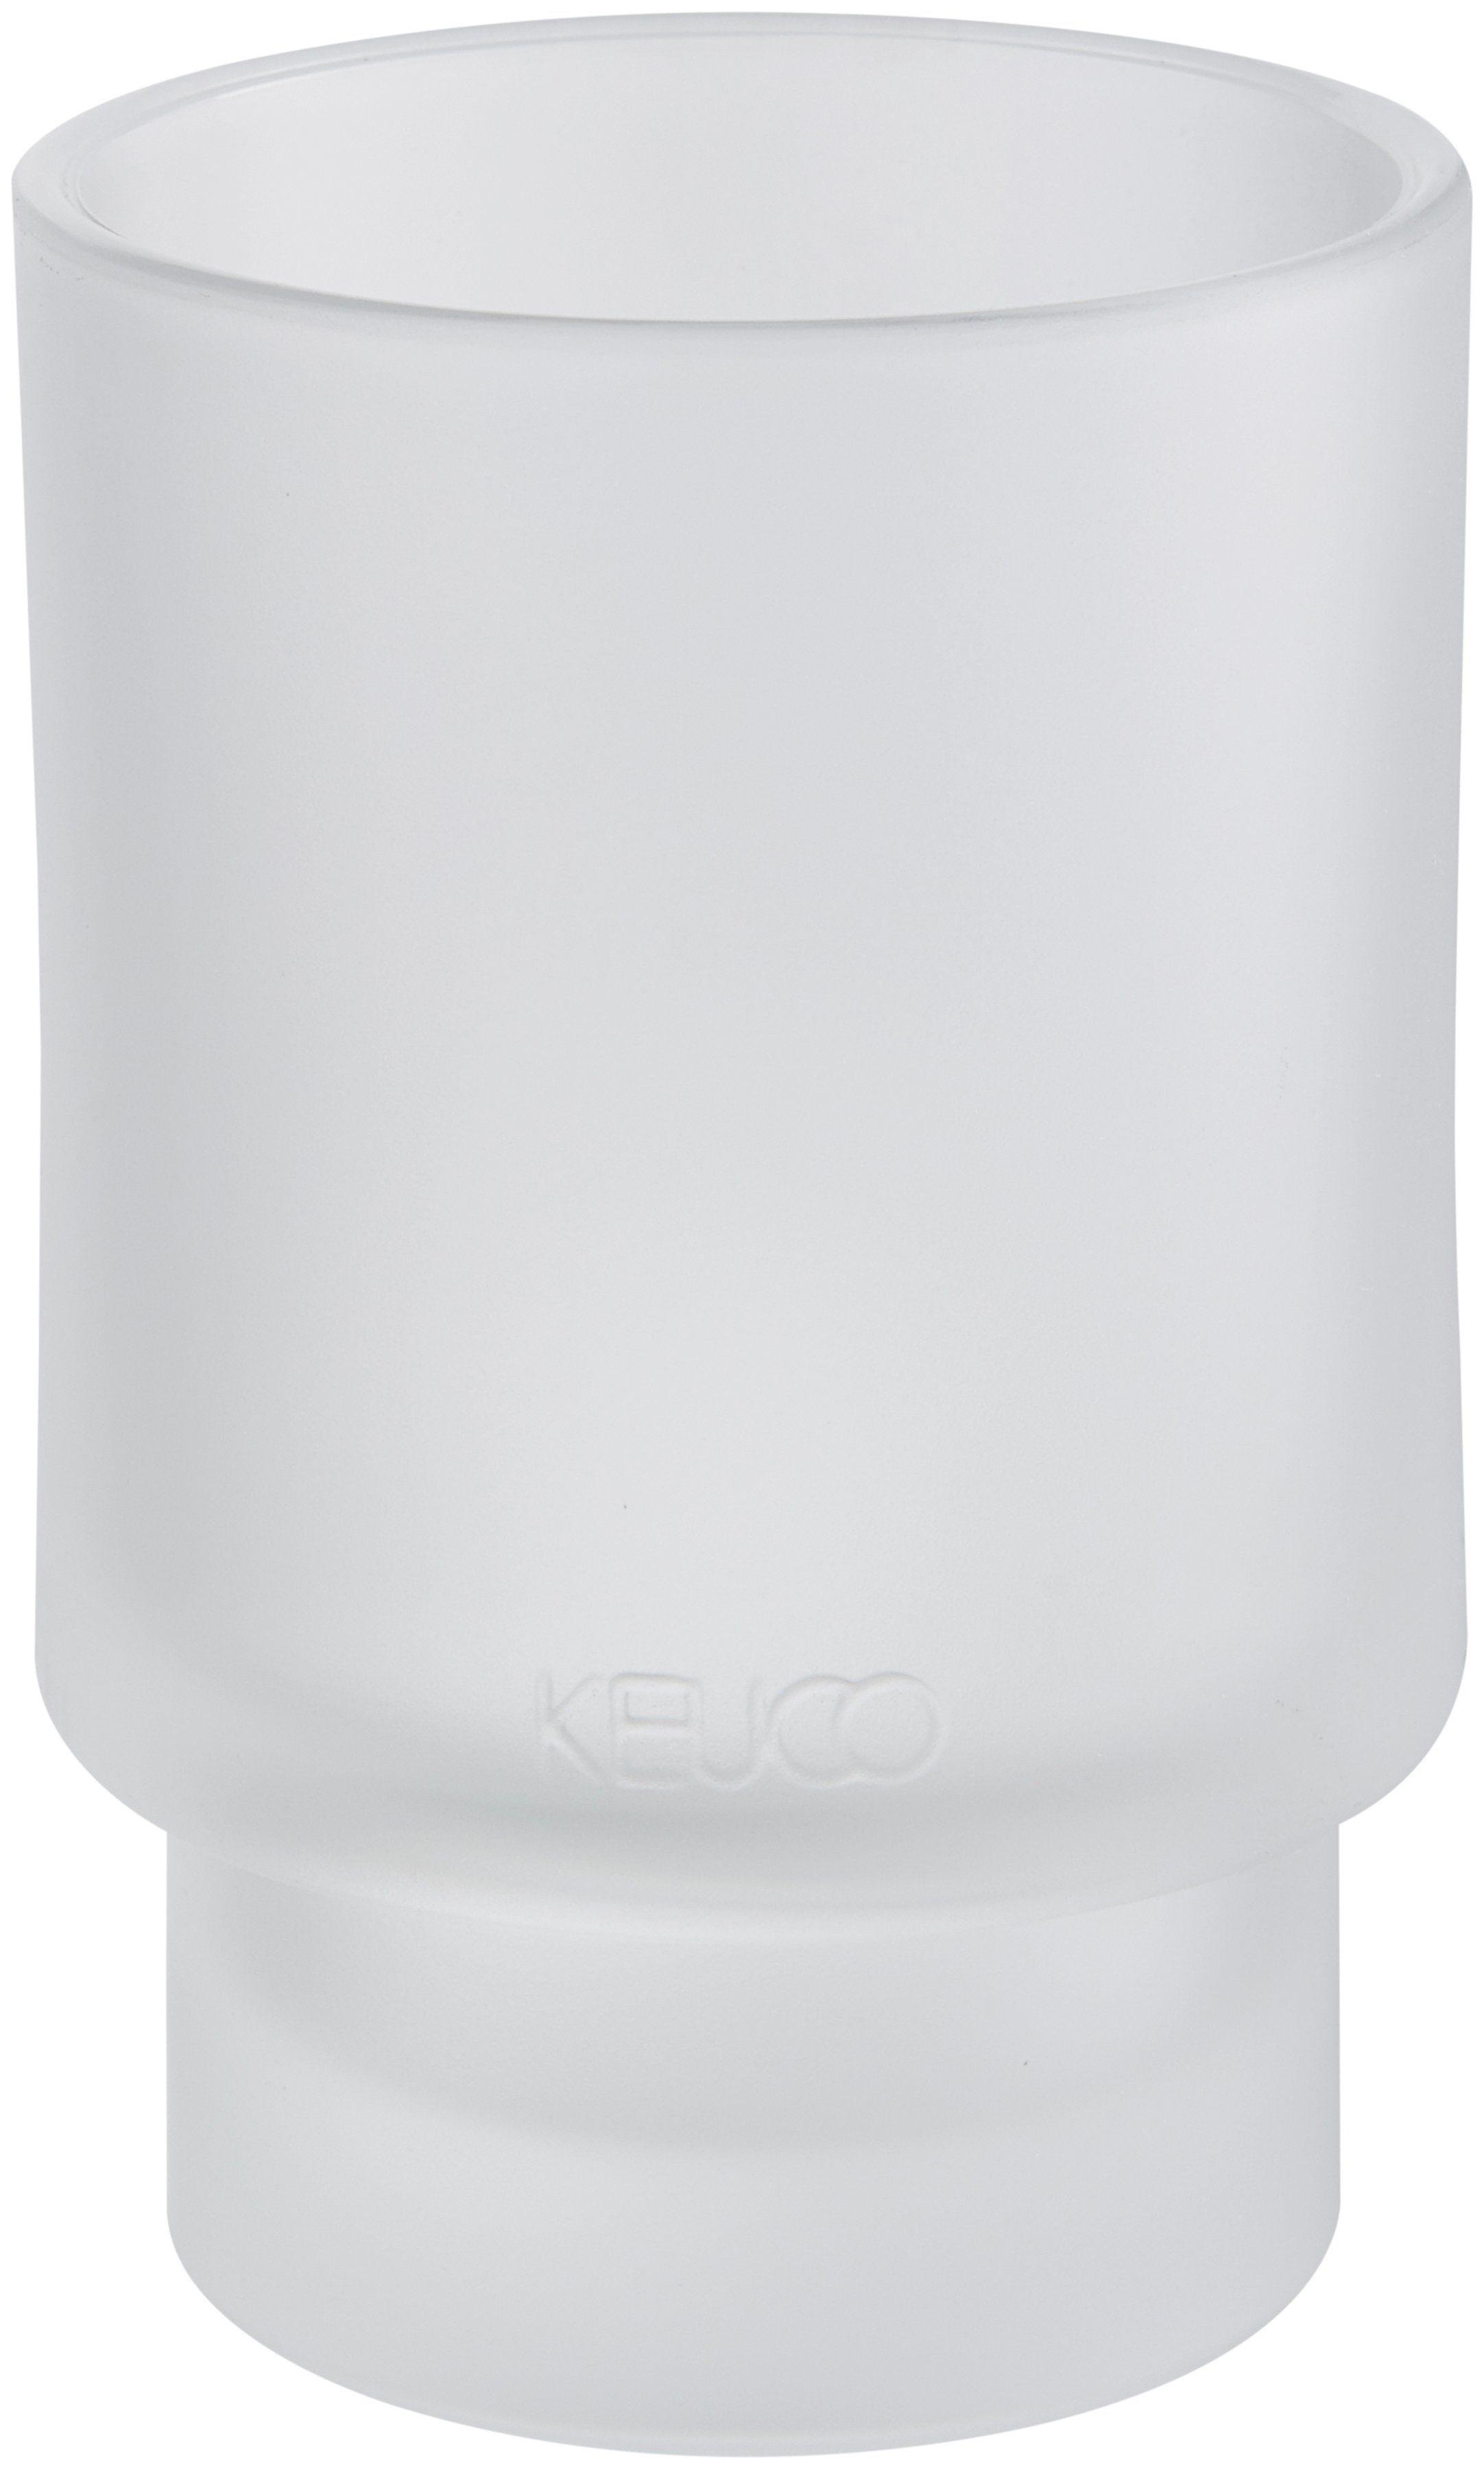 KEUCO Ersatzglas »Edition 300«, Echtkristall-Glas mattiert, lose